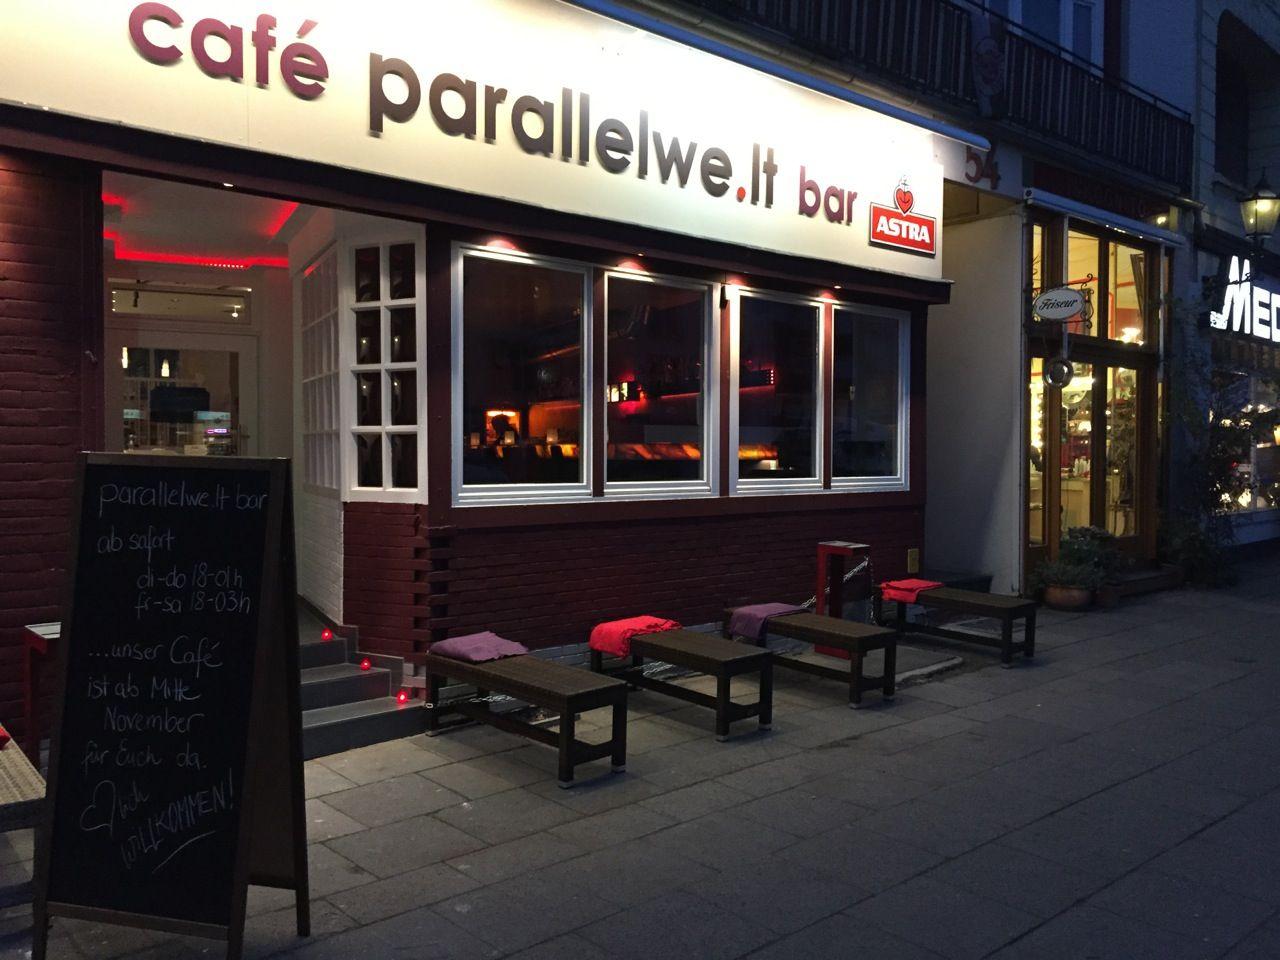 Cafe Parallelwe.lt Bar Hamburg